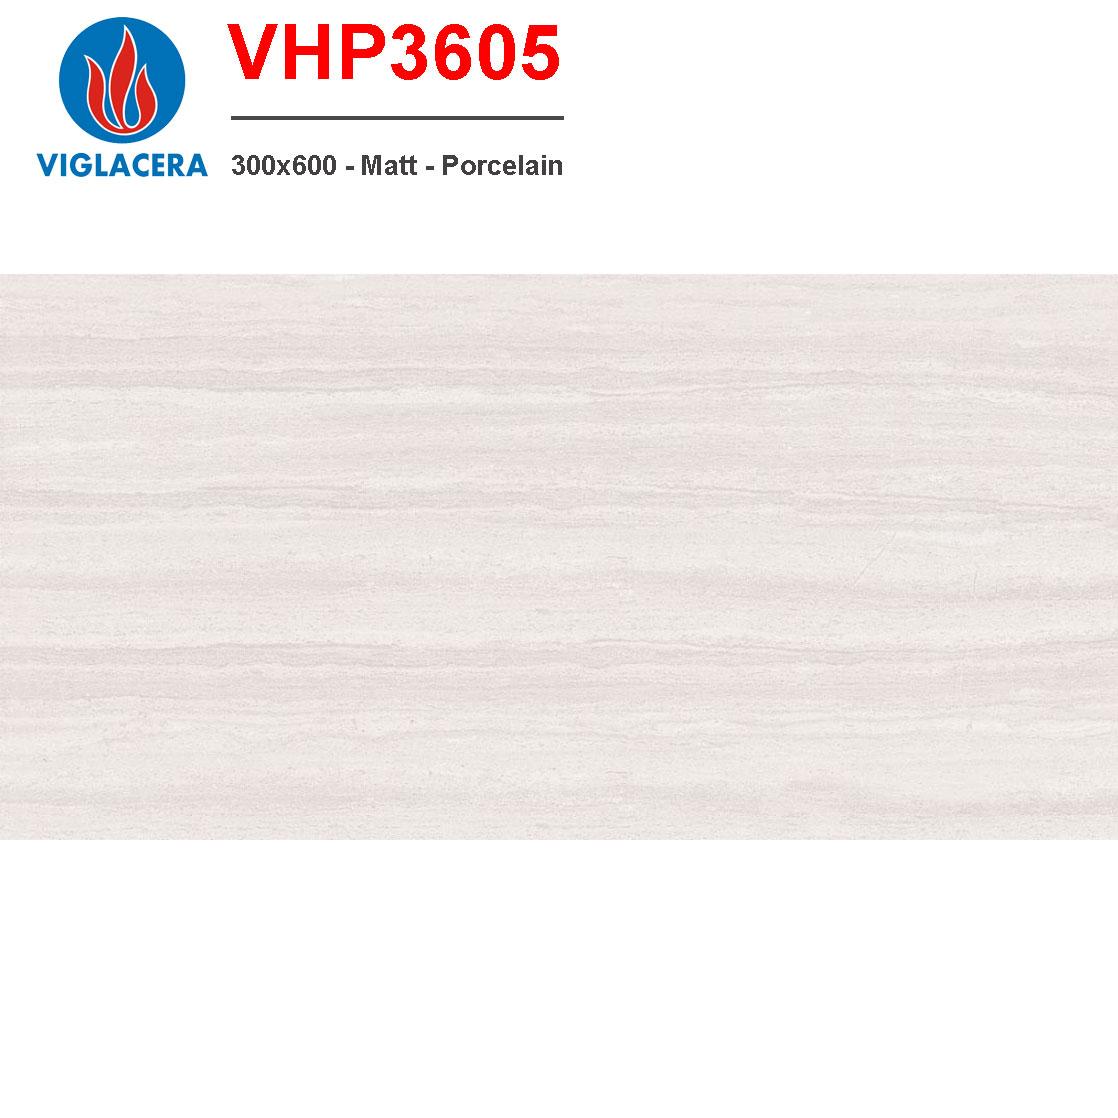 Gạch ốp tường Viglacera VHP3605 cao cấp